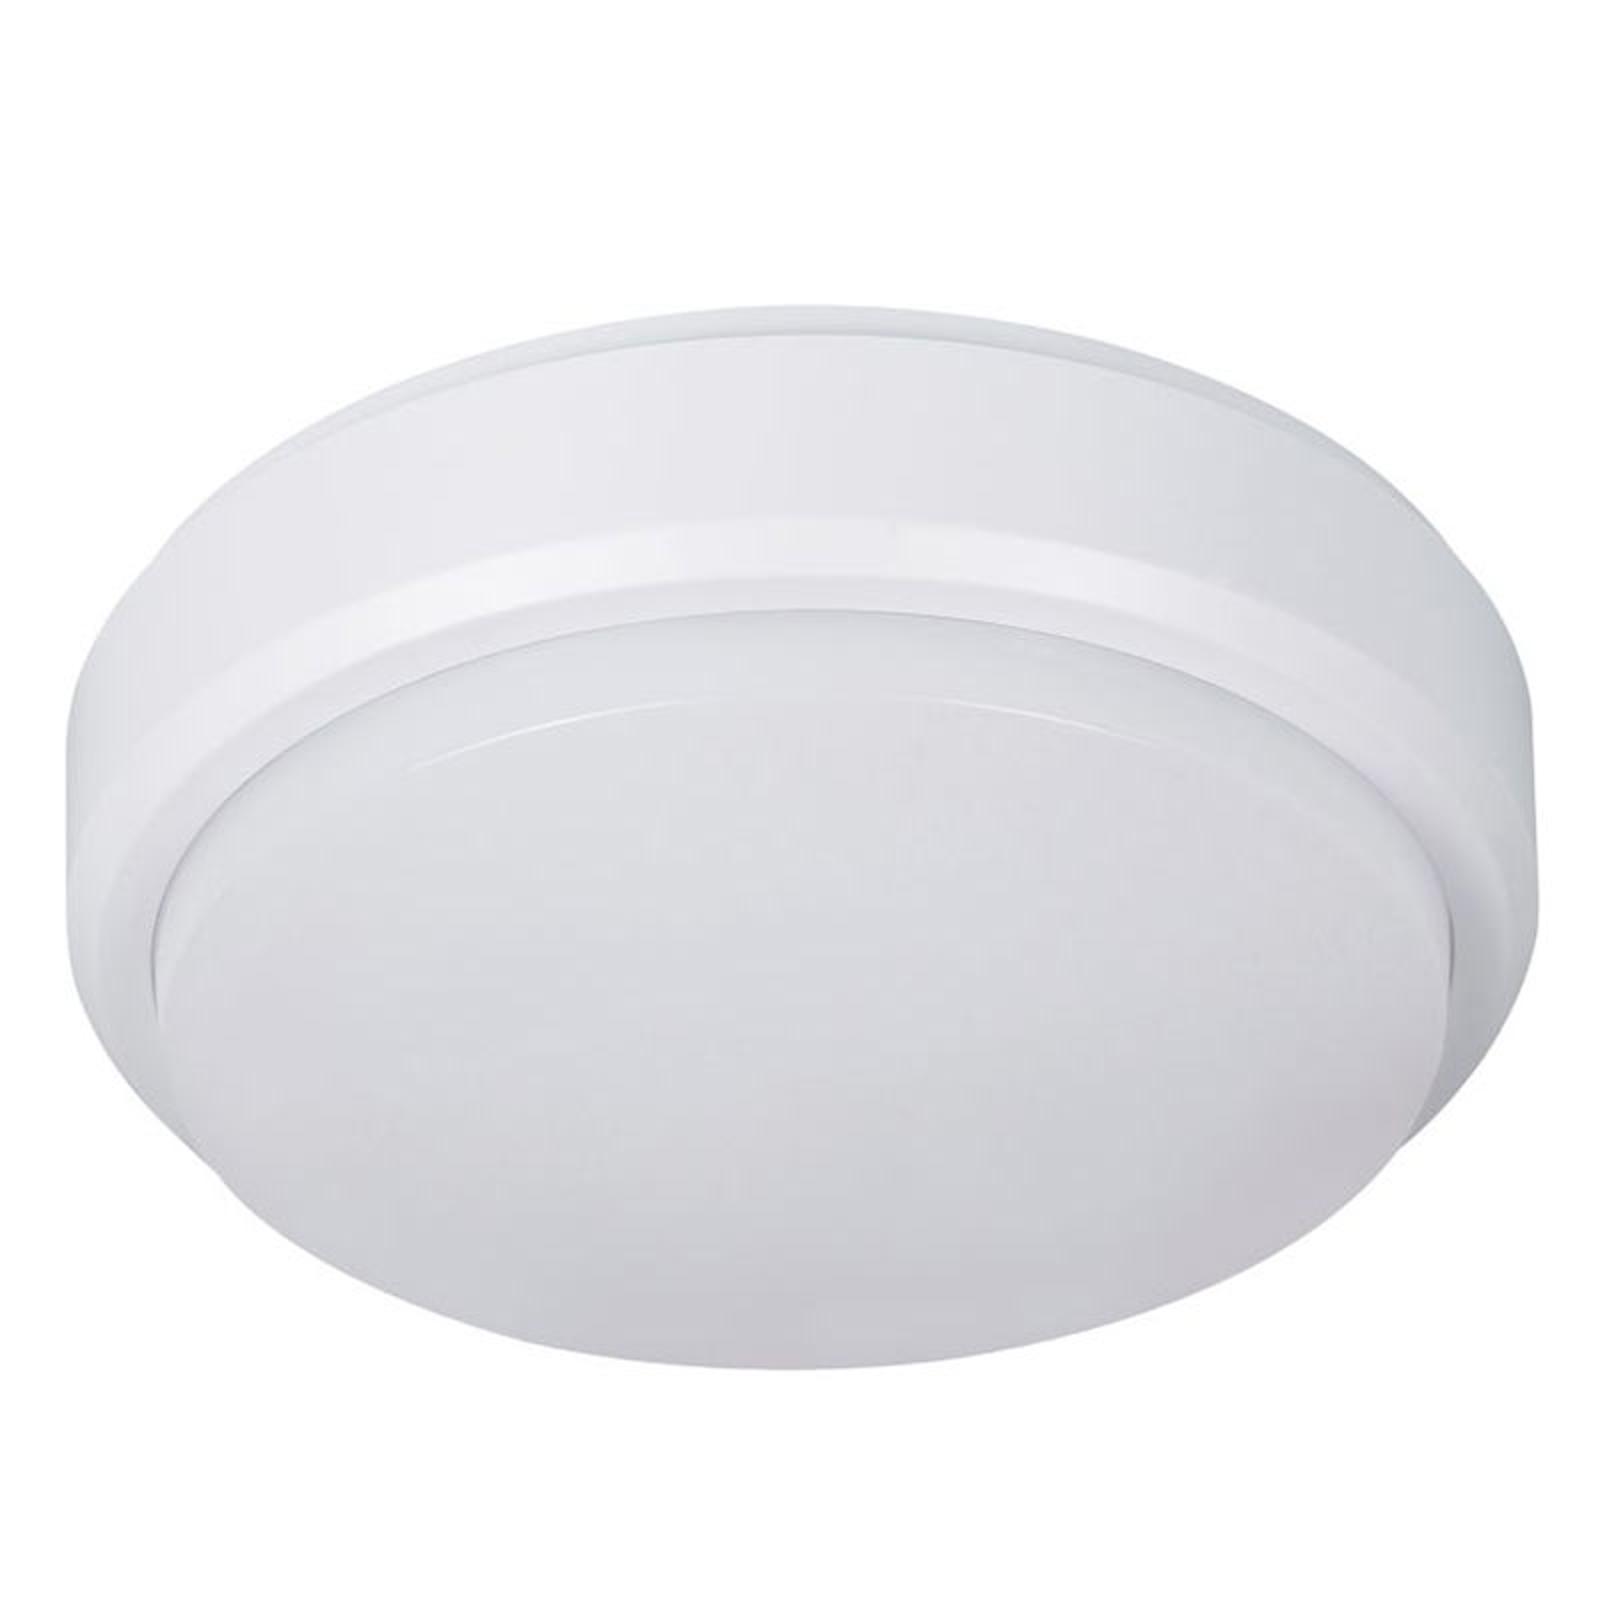 Ronde LED plafondlamp Bulkhead met IP54